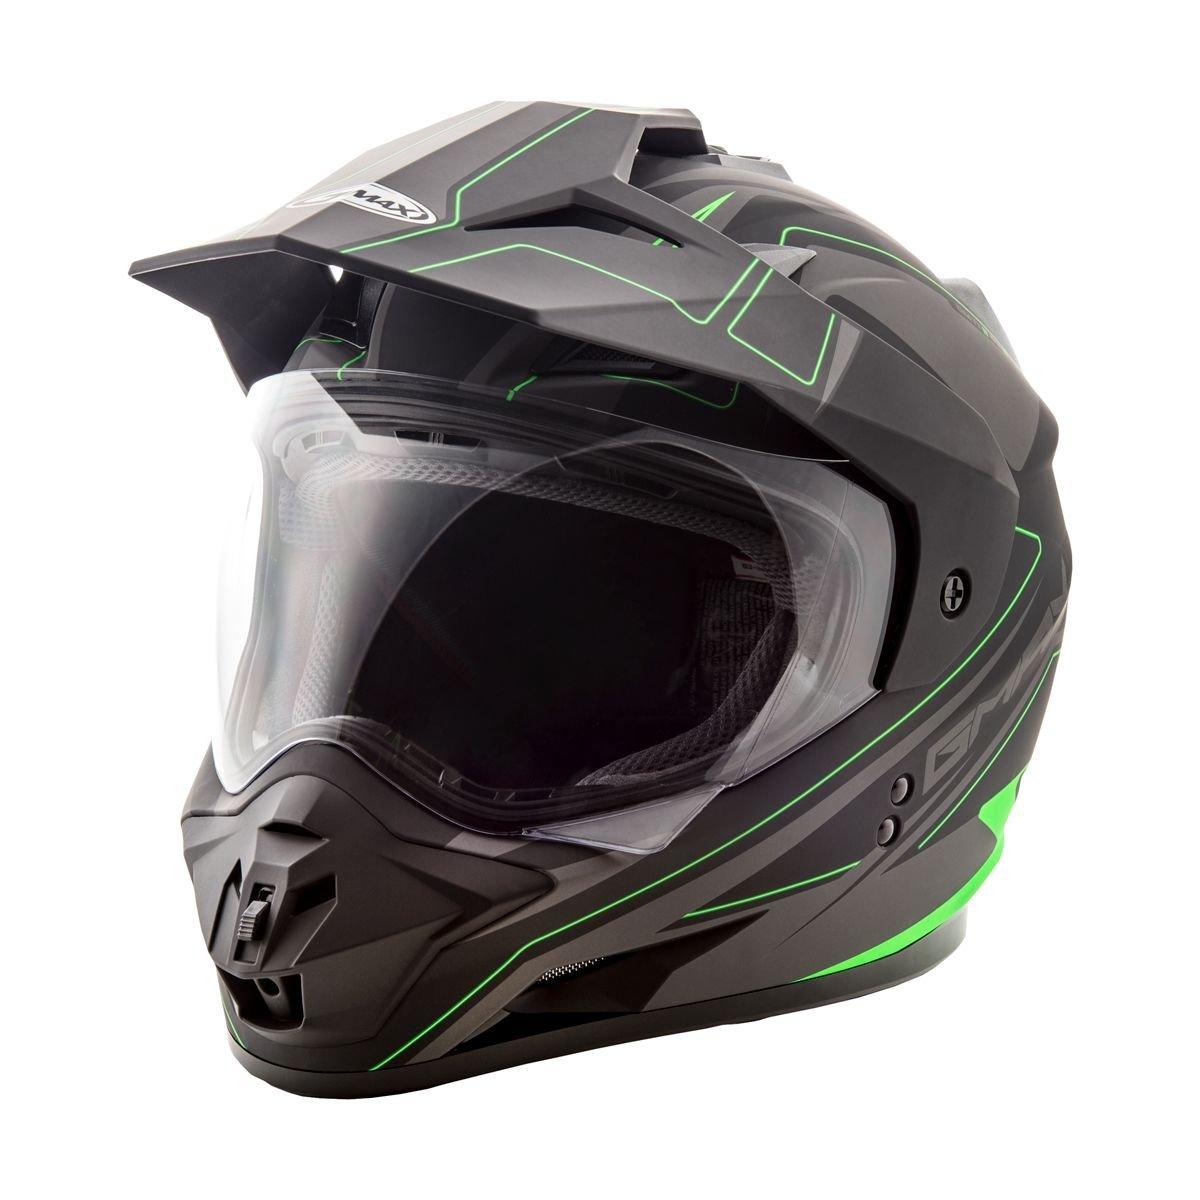 GMax GM11D Expedition Matte Black/Hi-Viz Green Dual Sport Helmet - Large